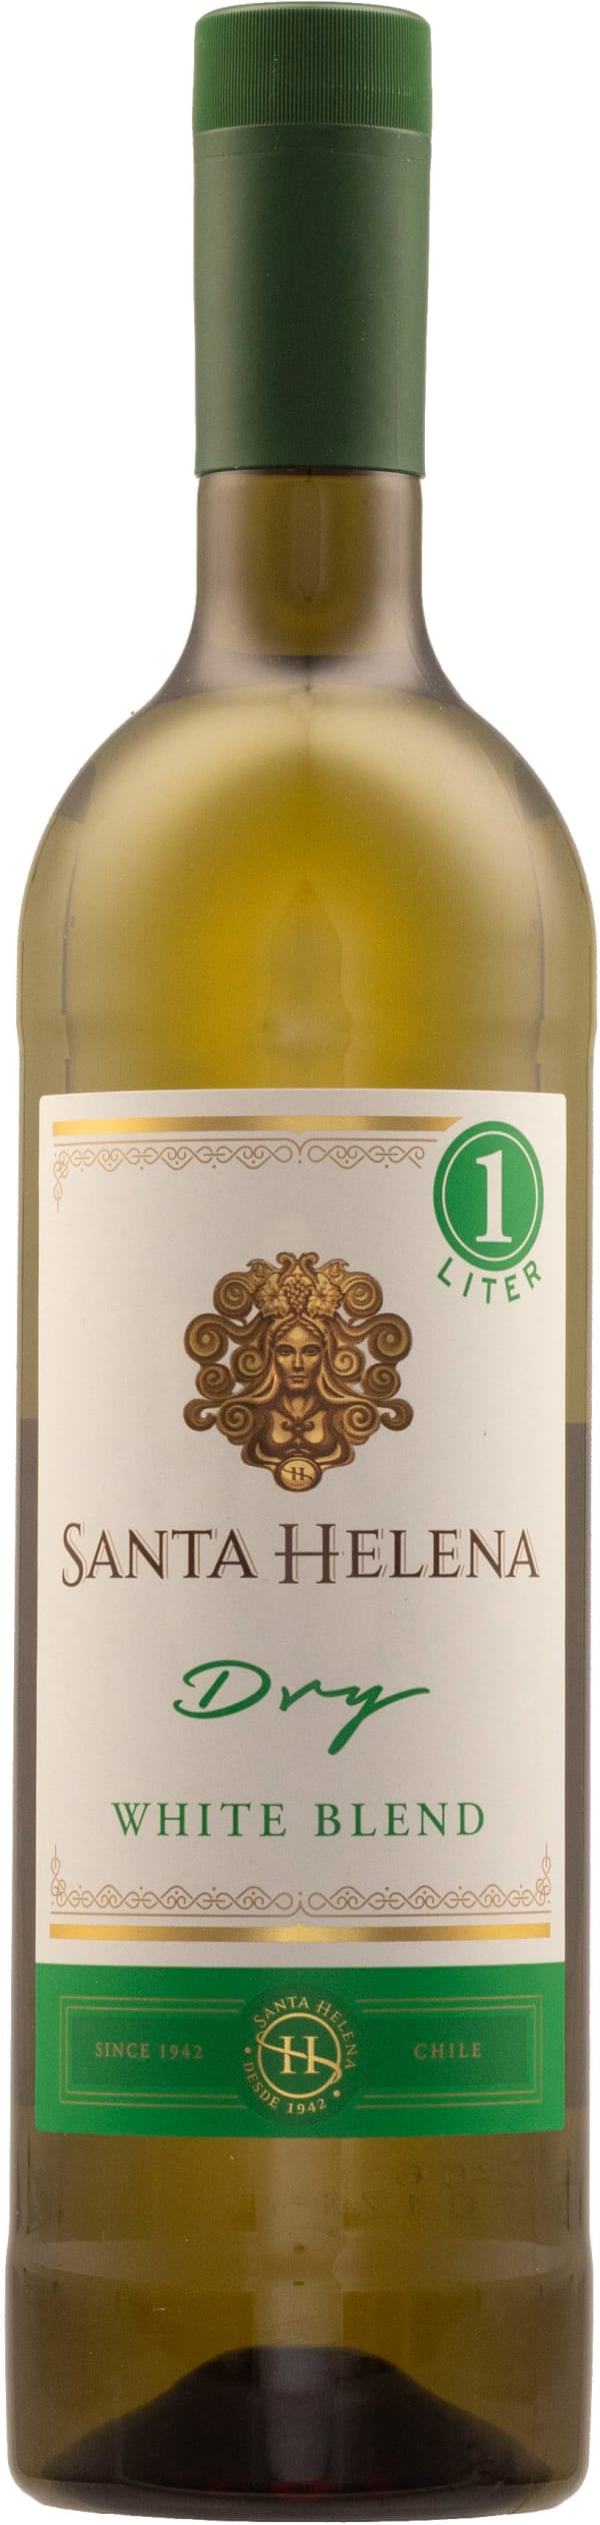 Santa Helena Varietal White Blend 2020 plastflaska